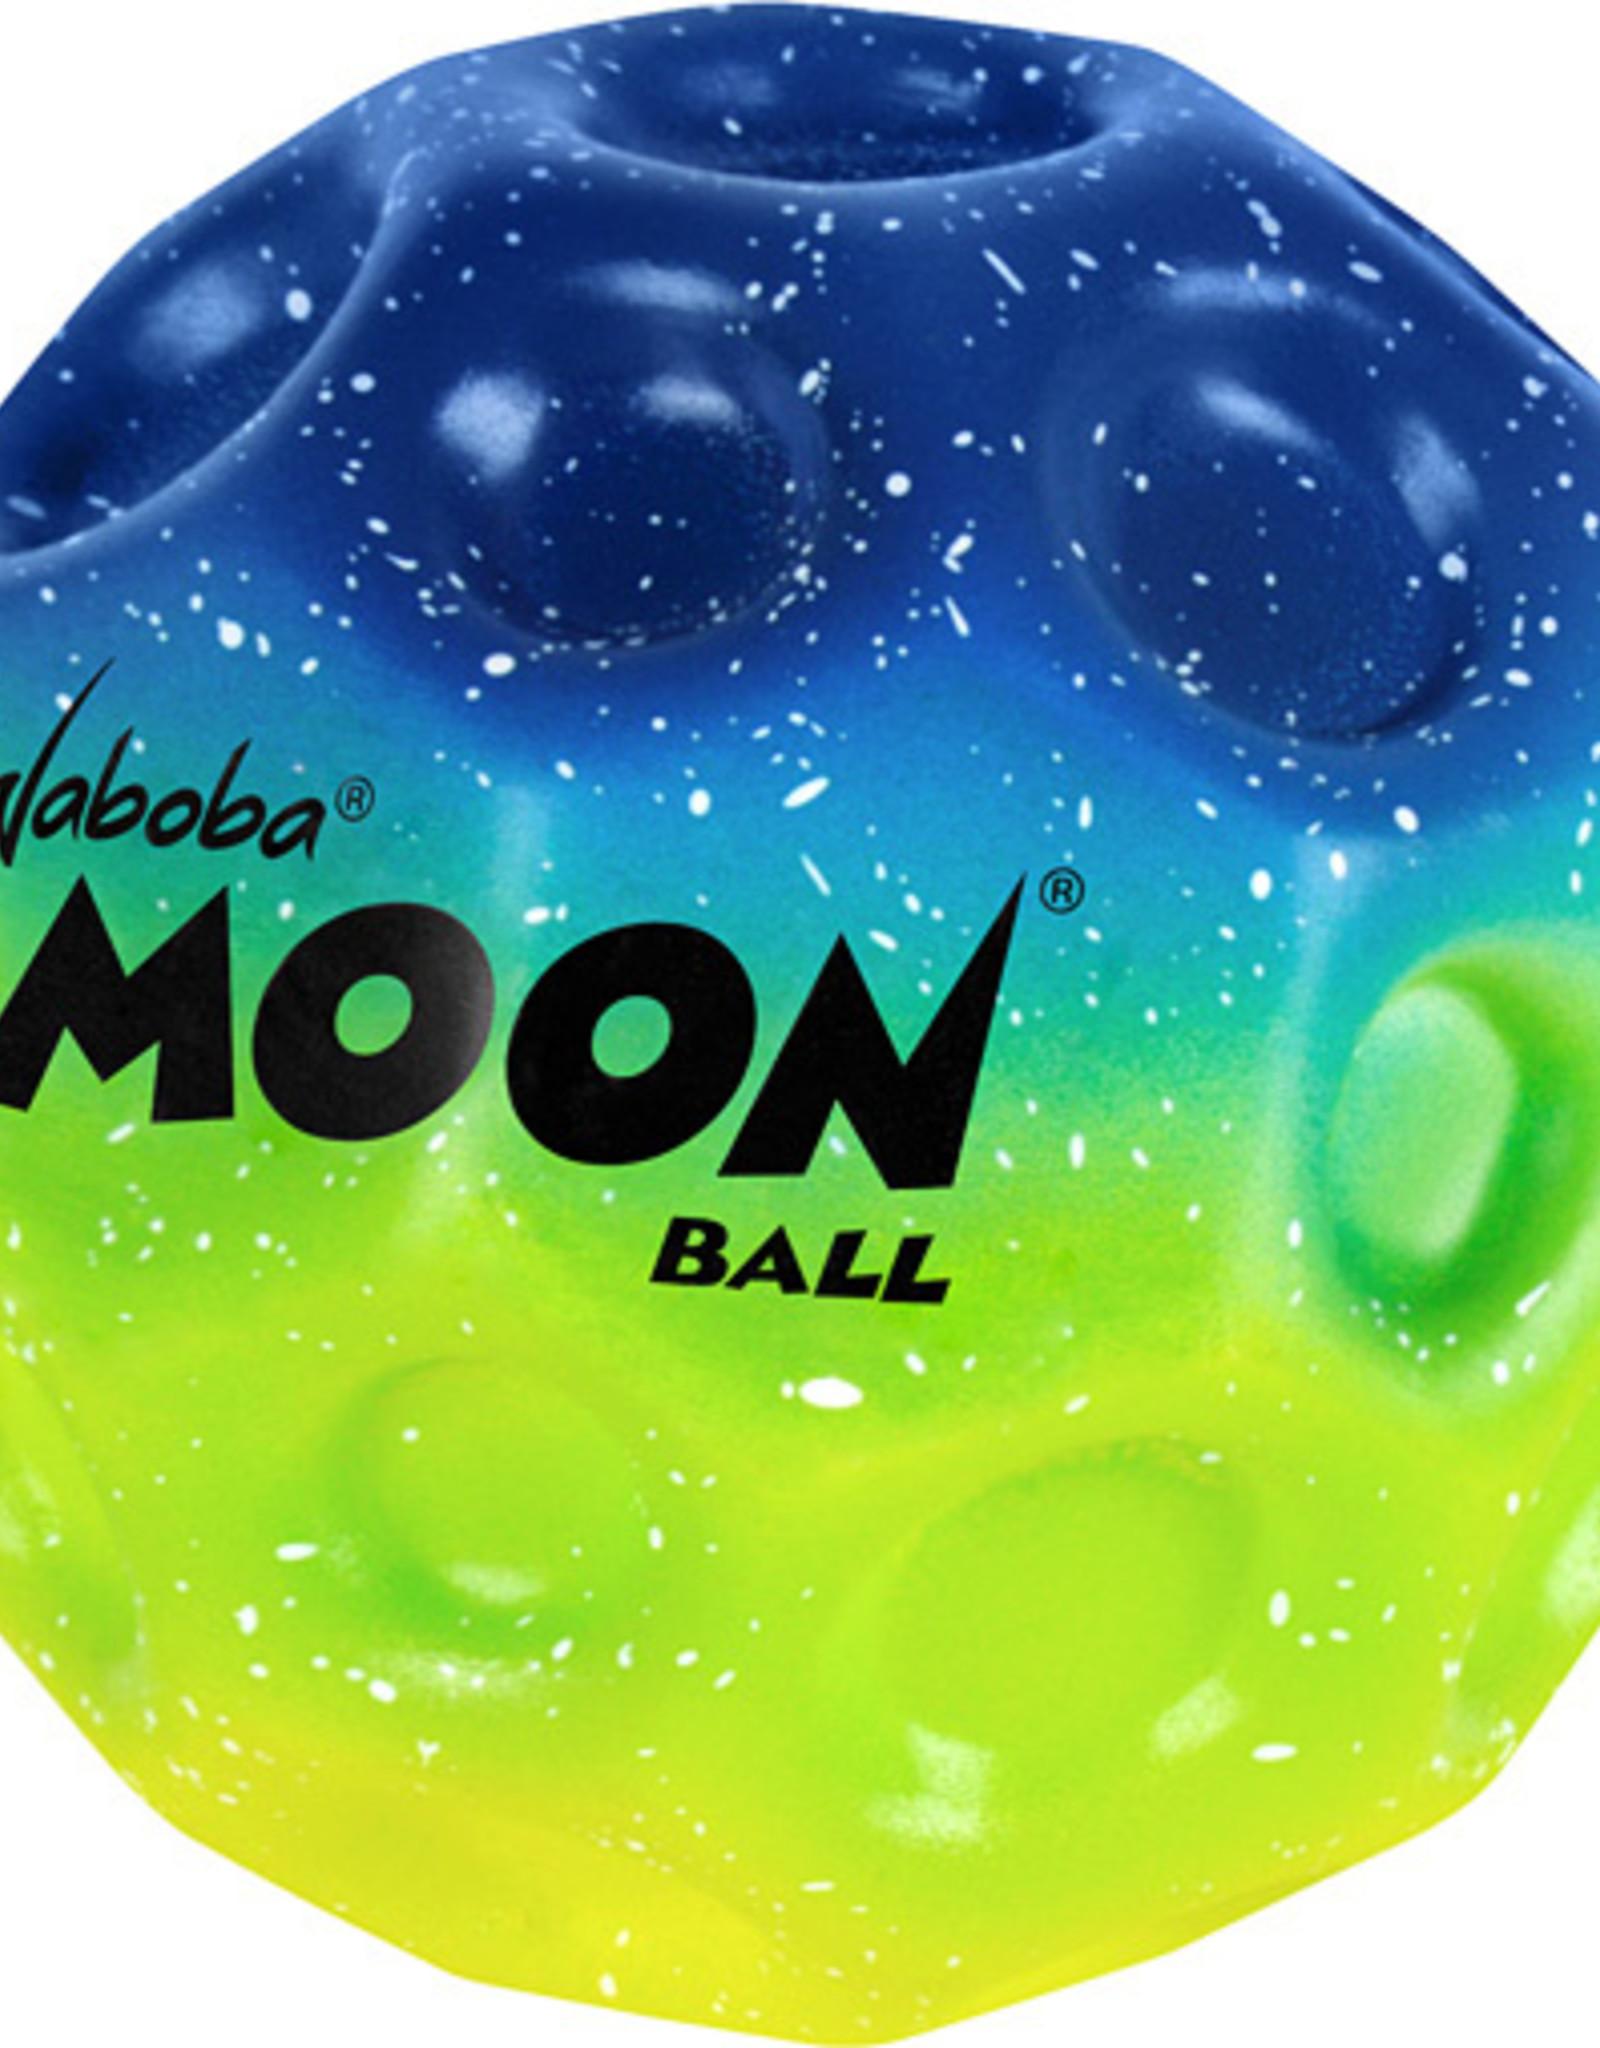 Gradiant Moon Ball